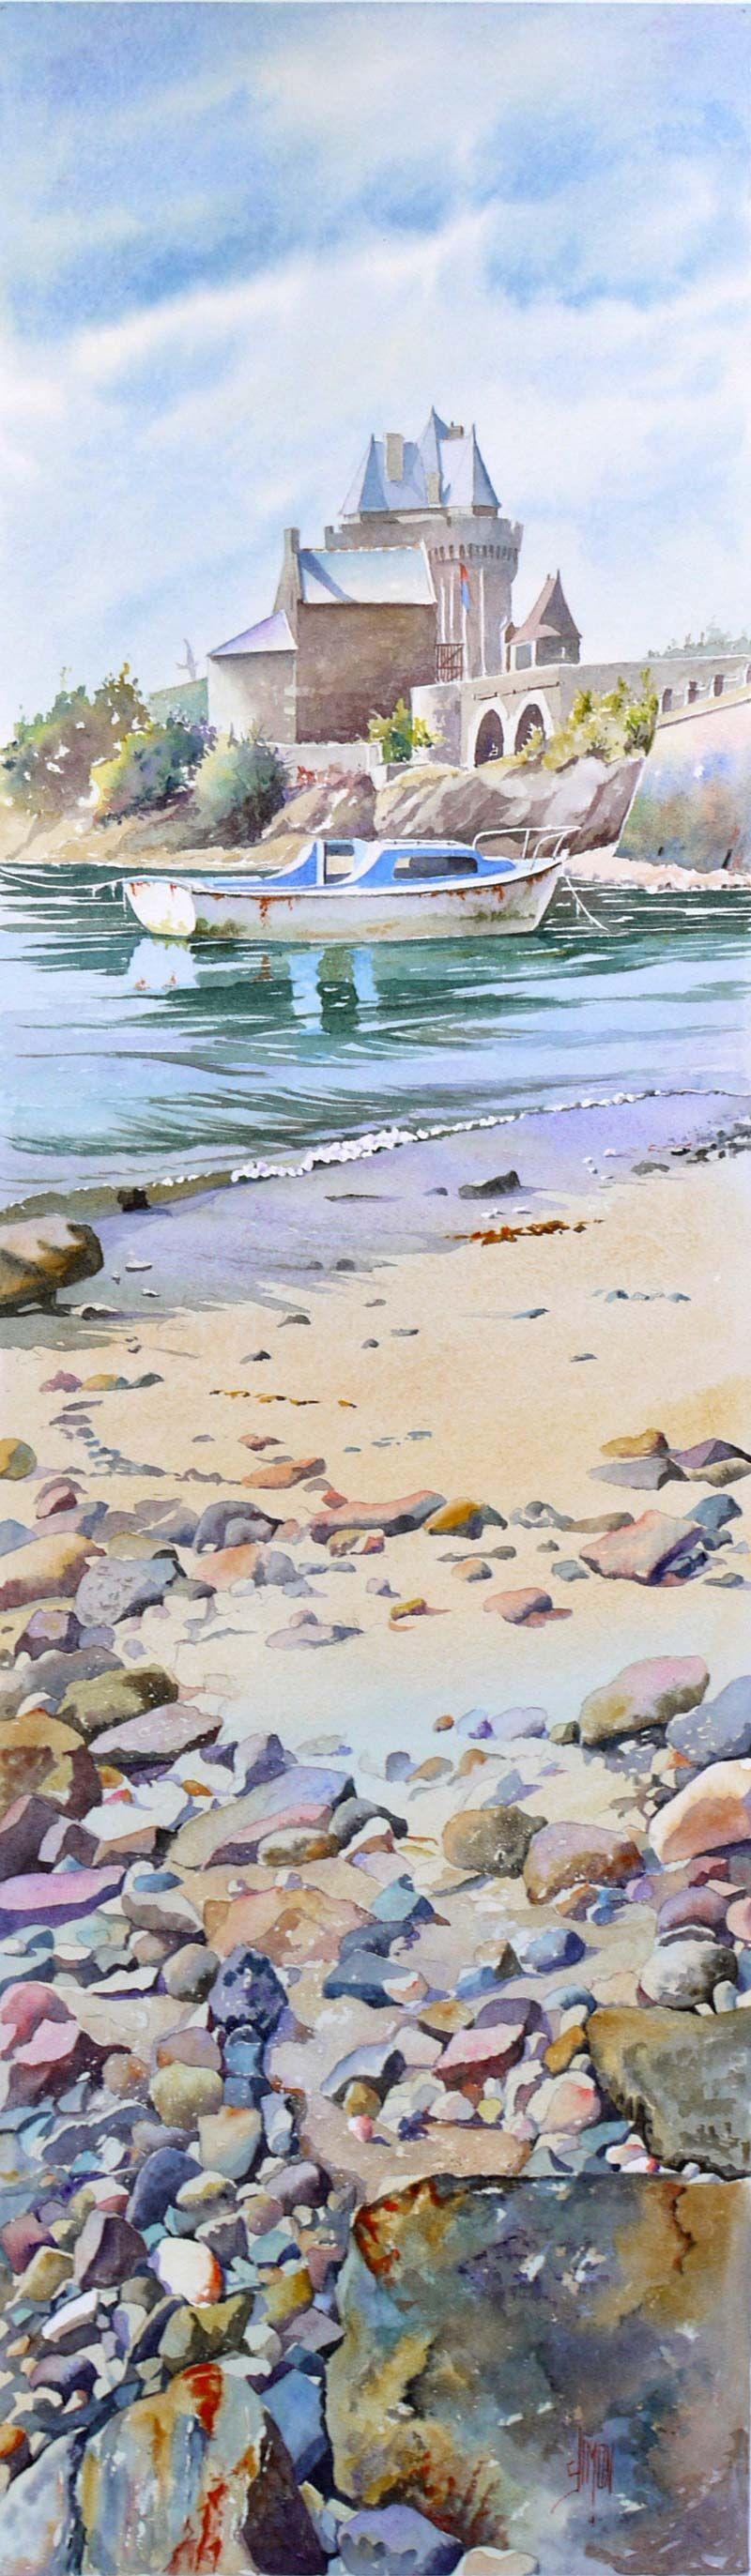 galets de saint sevran jo l simon la mer en peinture the sea in painting aquarelle. Black Bedroom Furniture Sets. Home Design Ideas